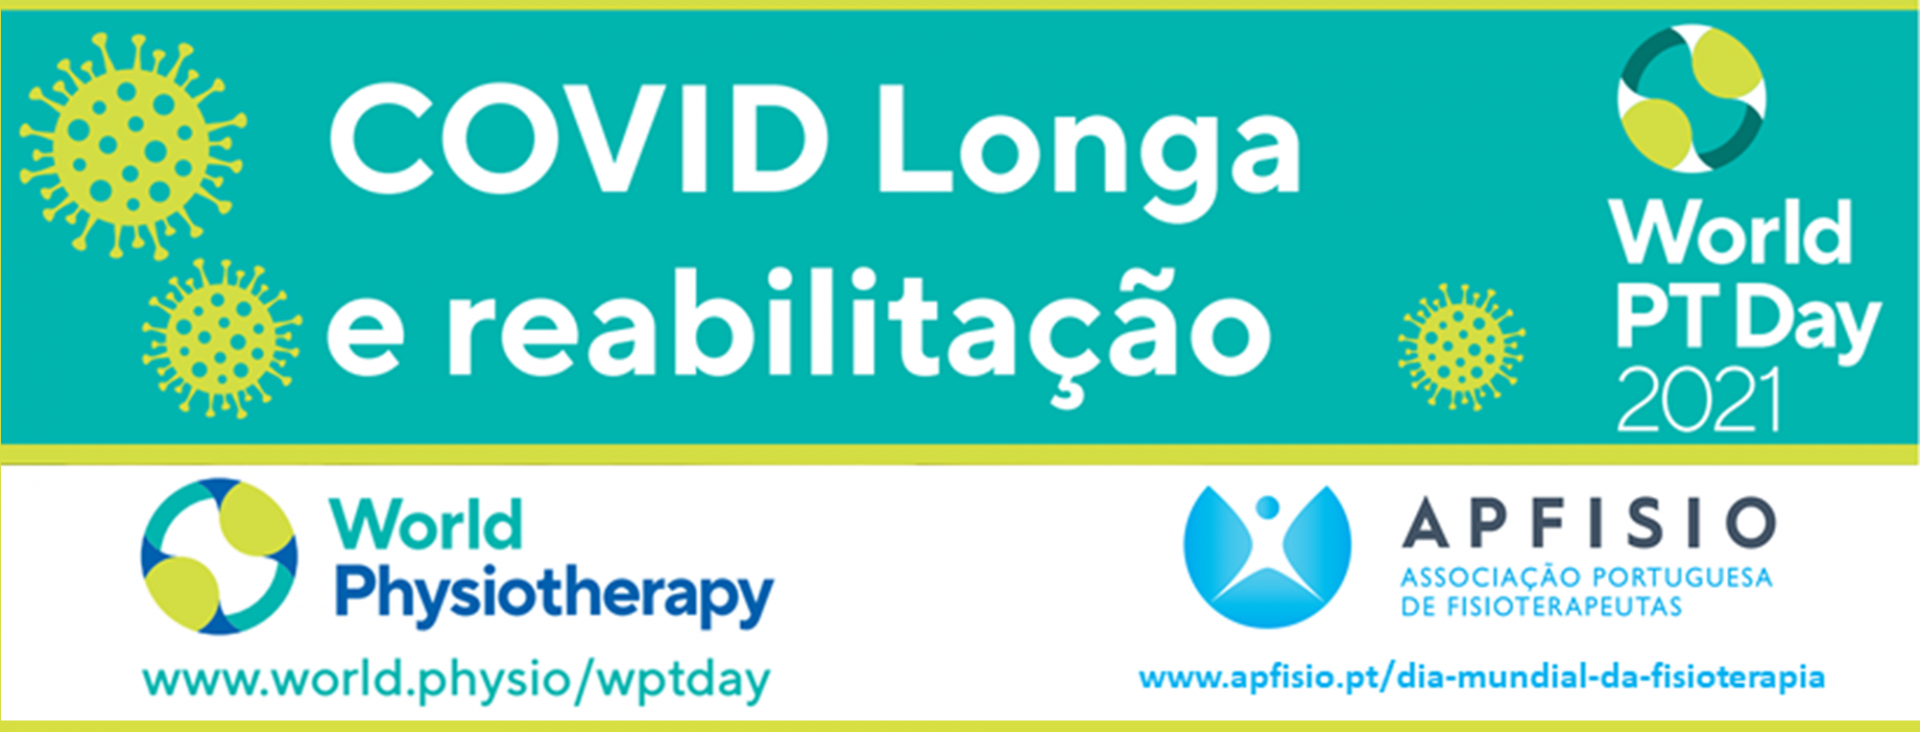 <p>O Dia Mundial da Fisioterapia na Imprensa</p>